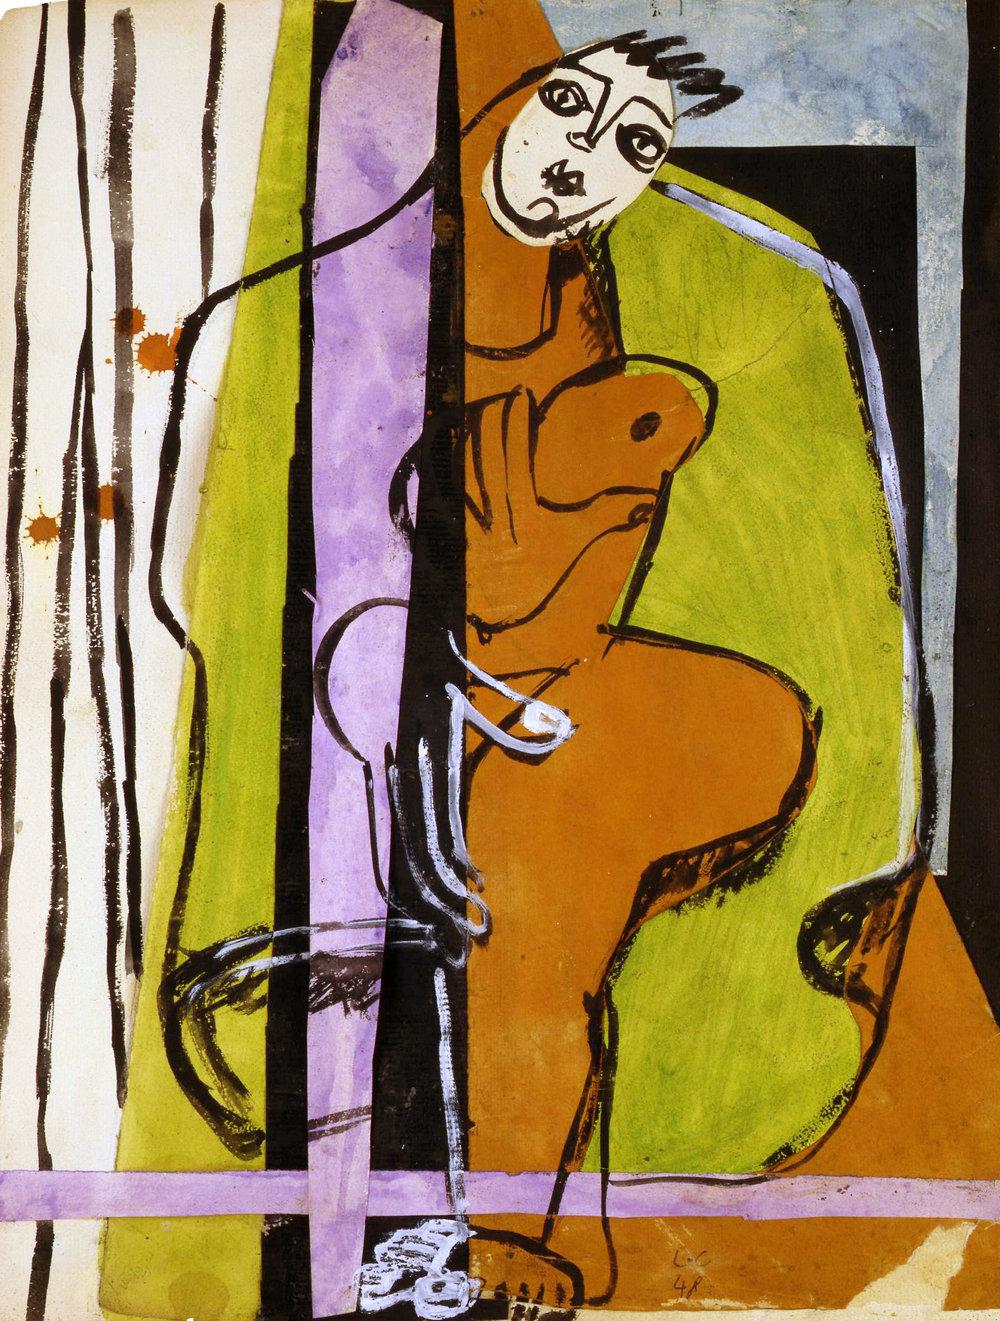 Charles-Édouard Jeanneret, called Le Corbusier, Swiss/French (La Chaux-de-Fonds, Switzerland, 1887 – 1965, Roquebrune-Cap-Martin, France),  Coeur sur la main , 1948, collage and gouache on paper, 19 1/8 x 14 1/2 inches. Image courtesy of Modernism Inc., San Francisco.